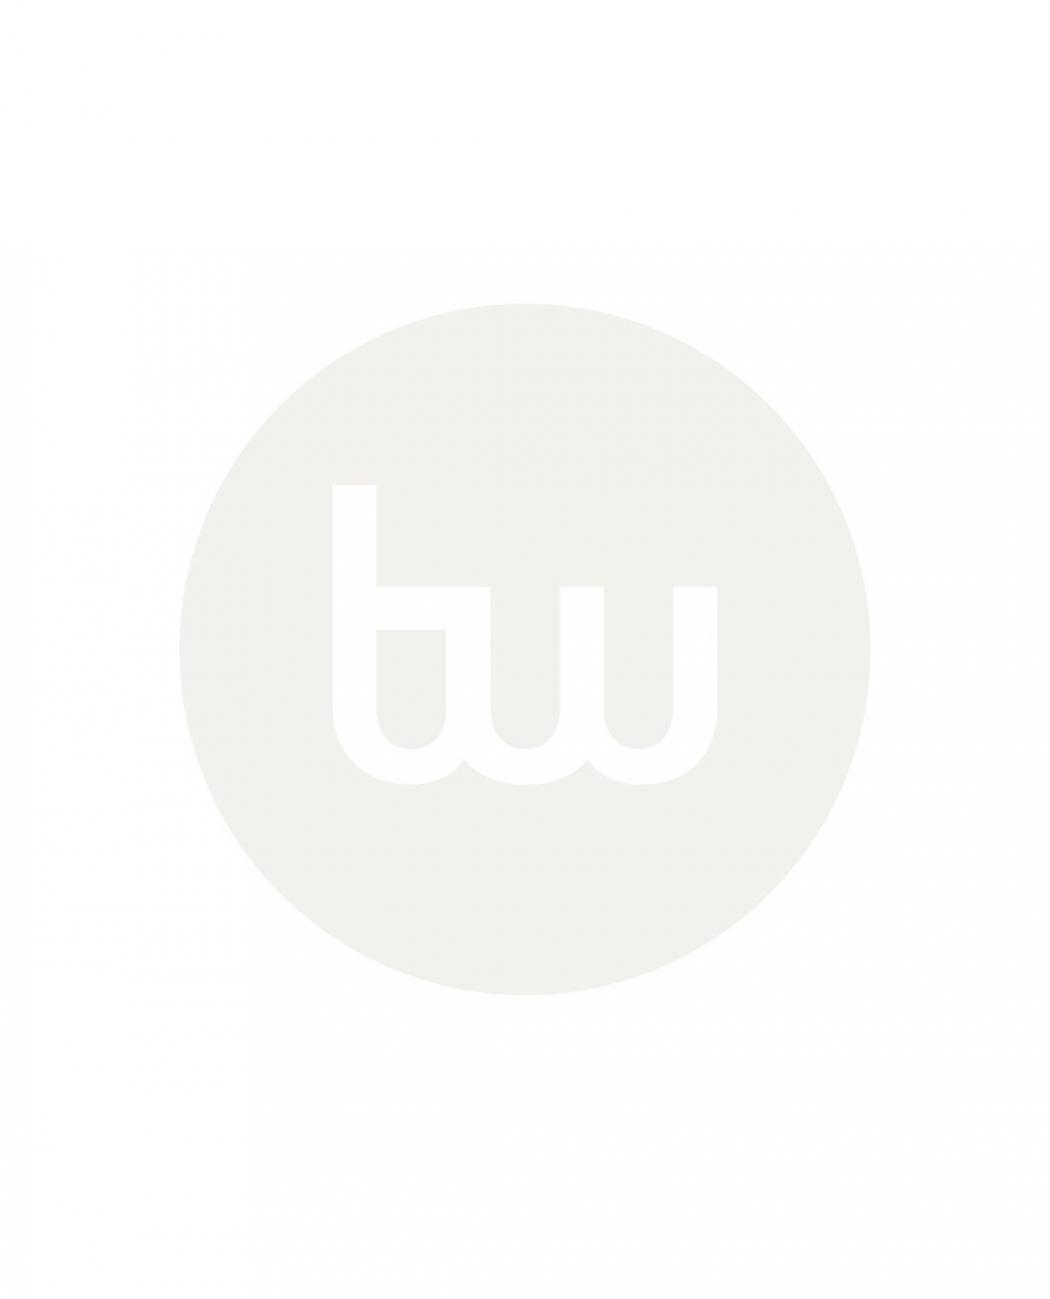 Verdande Weihnachtssocken Multicam Black - TACWRK